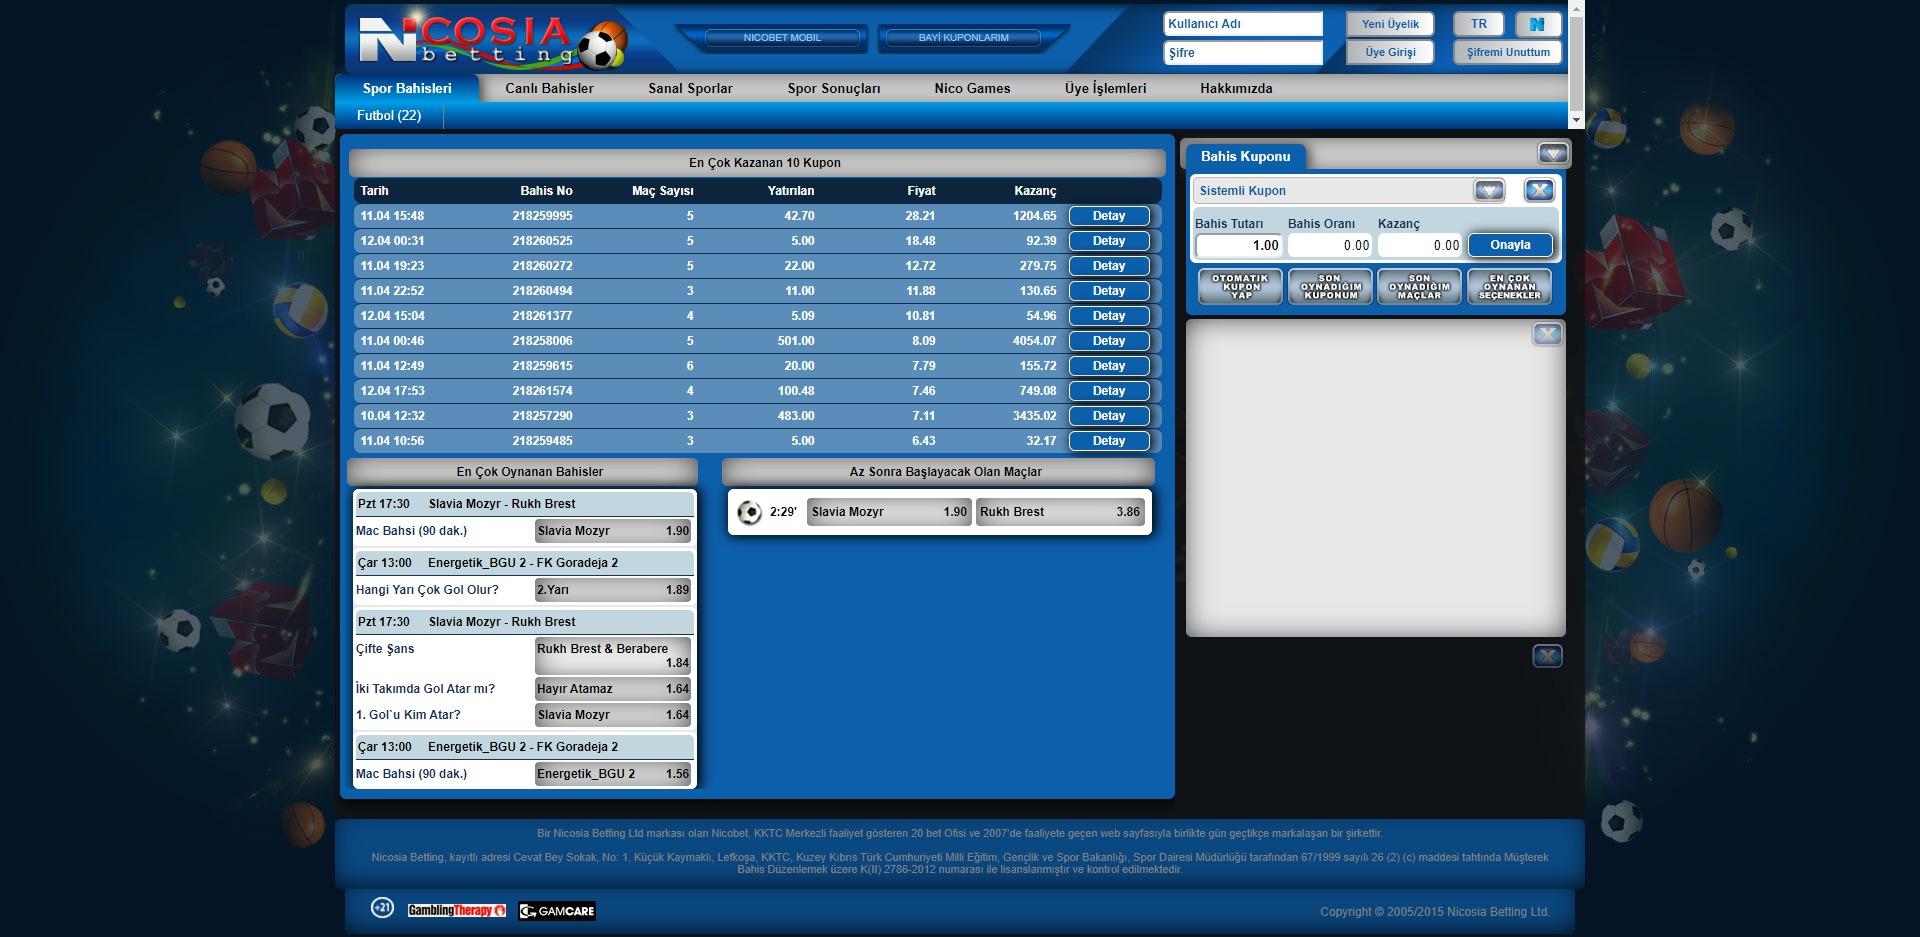 Villaggio primosole nicosia betting sportsbook betting percentages in vegas